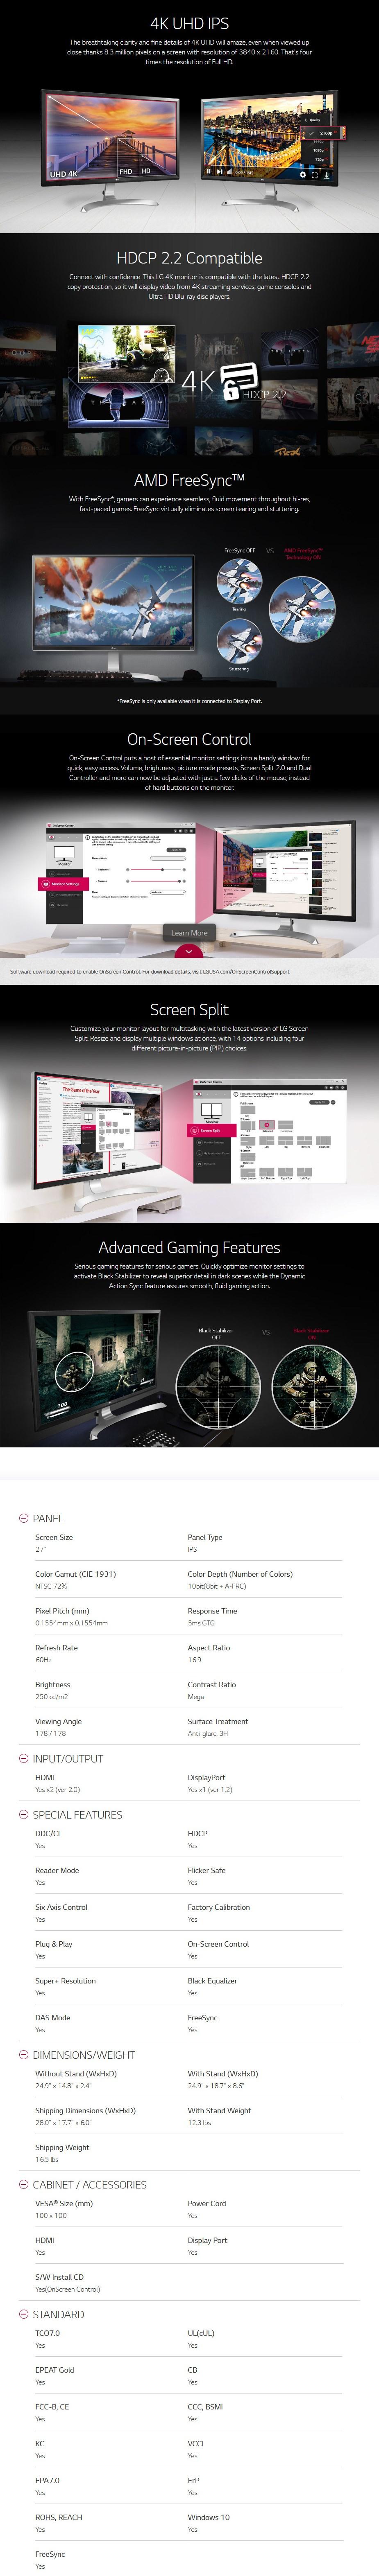 "LG 27UD59-B 27"" 4K UHD IPS Monitor - Desktop Overview 1"